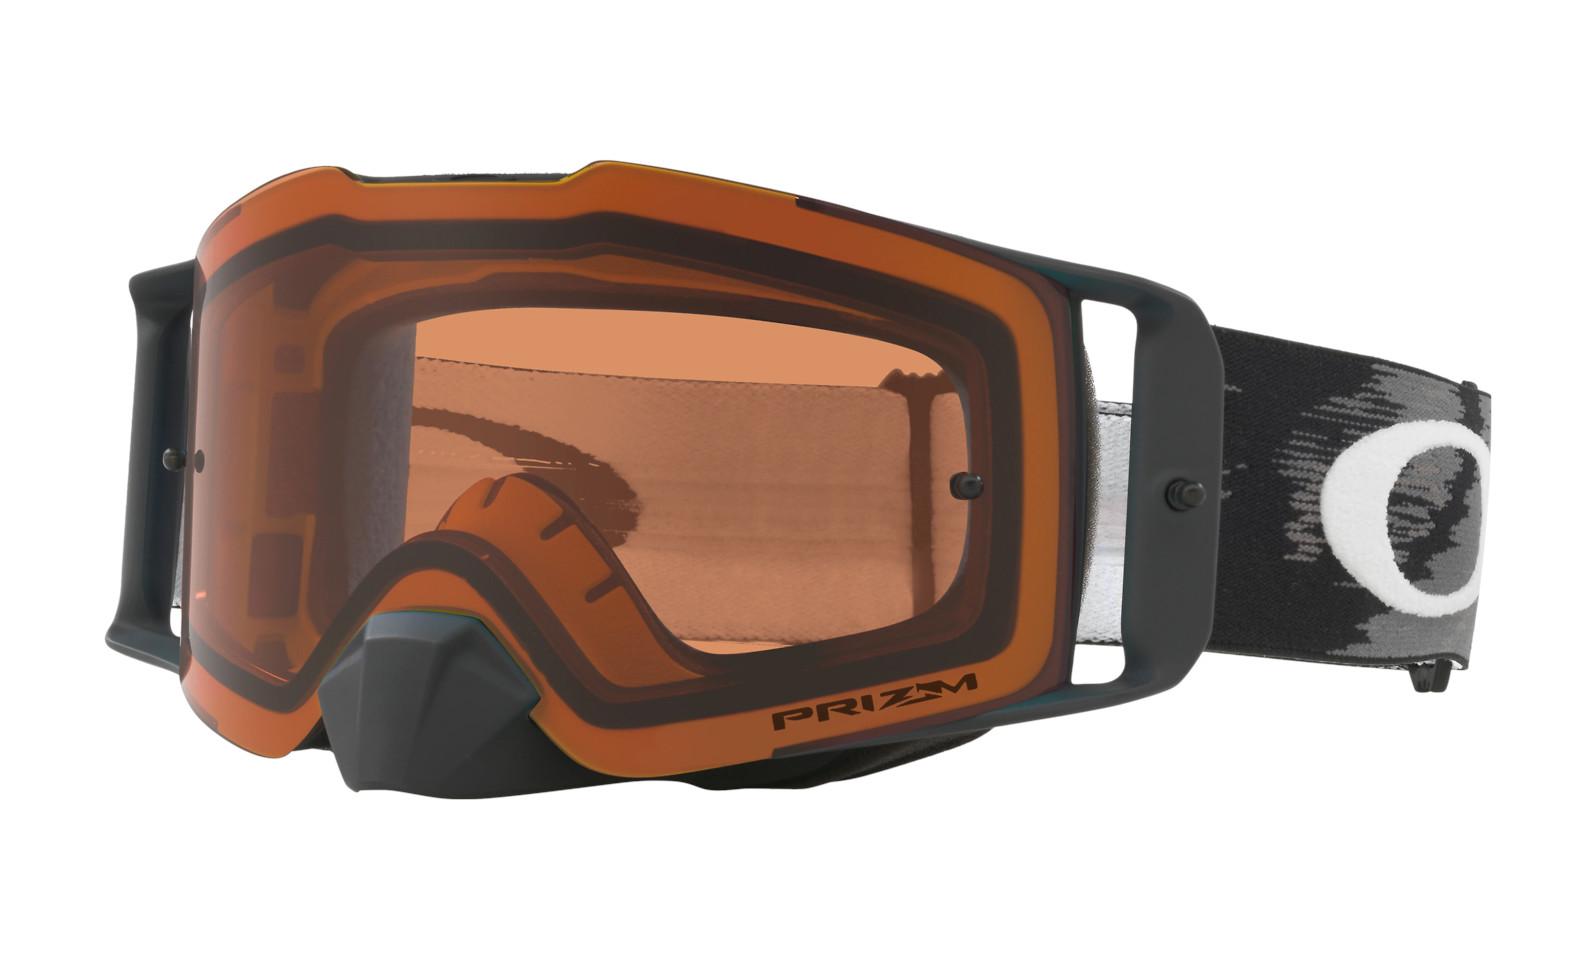 Oakley Front Line MX Goggles - Matte Black Speed frame, Prizm MX Bronze lens